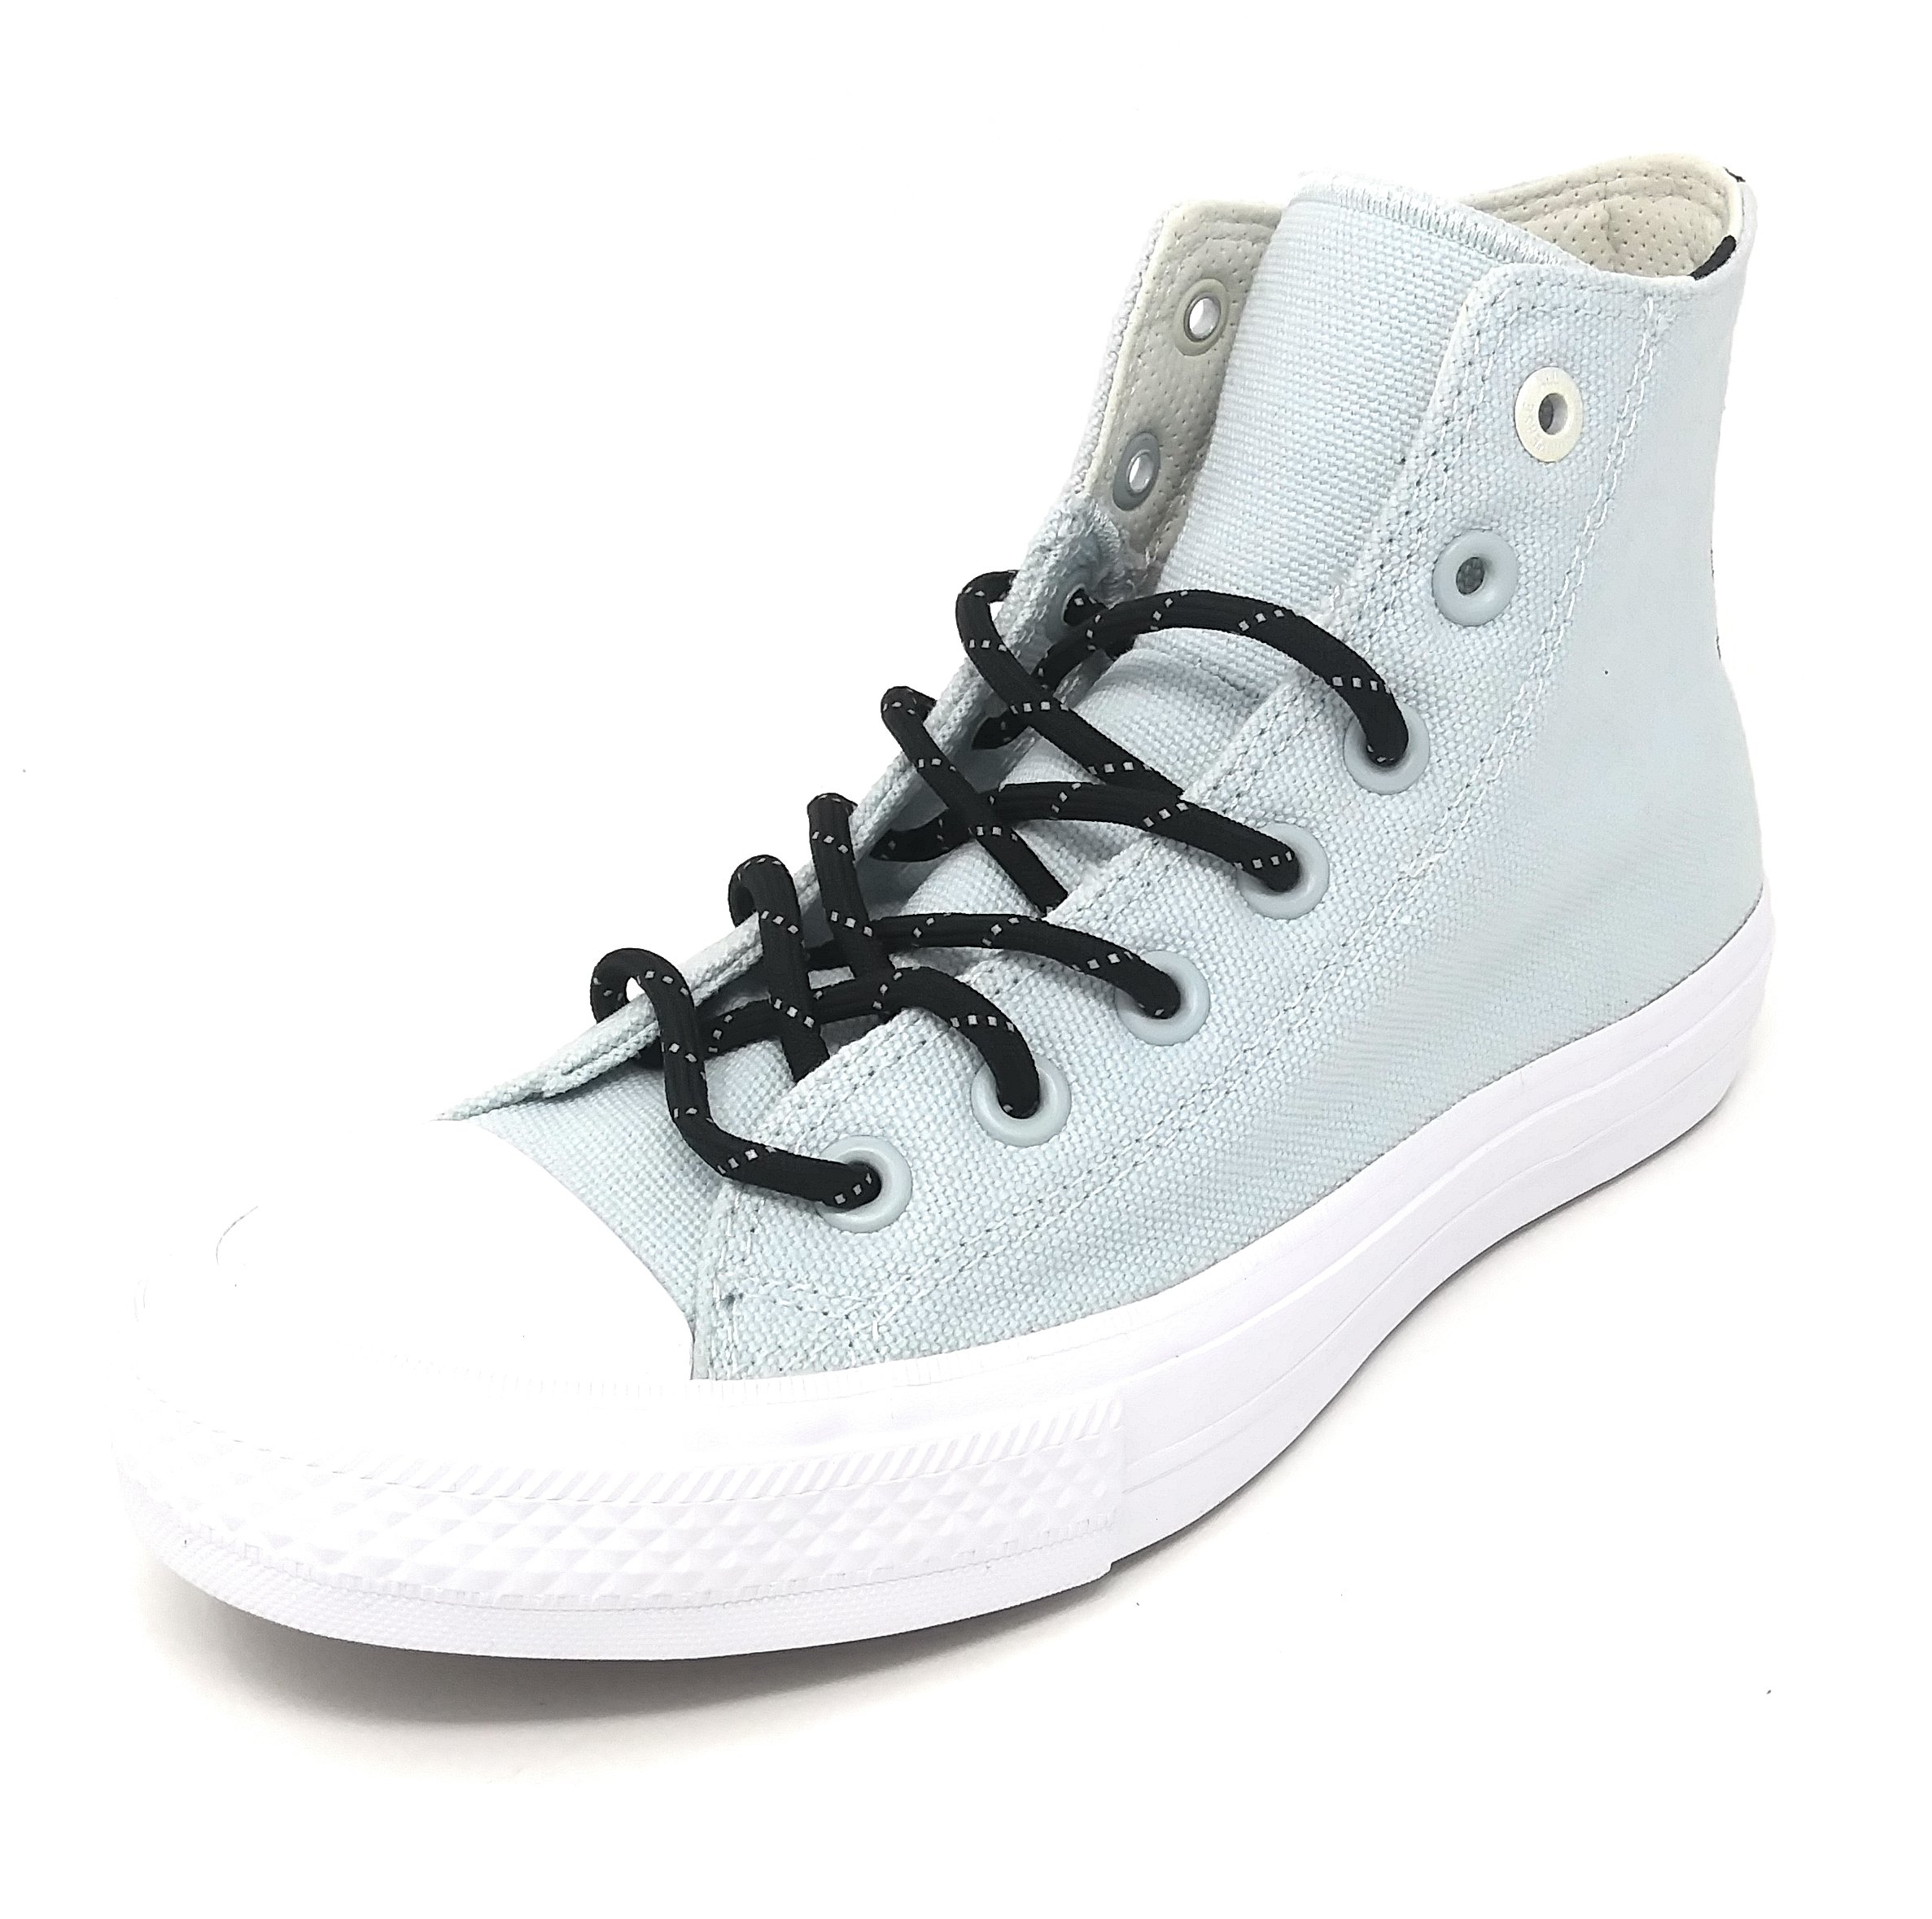 f374f74c9e8ce Galleon - Converse Chuck Taylor II All Star Hi Top Sneaker Shield Canvas  Polar (7.5 B(M) US Women / 5.5 D(M) US Men)